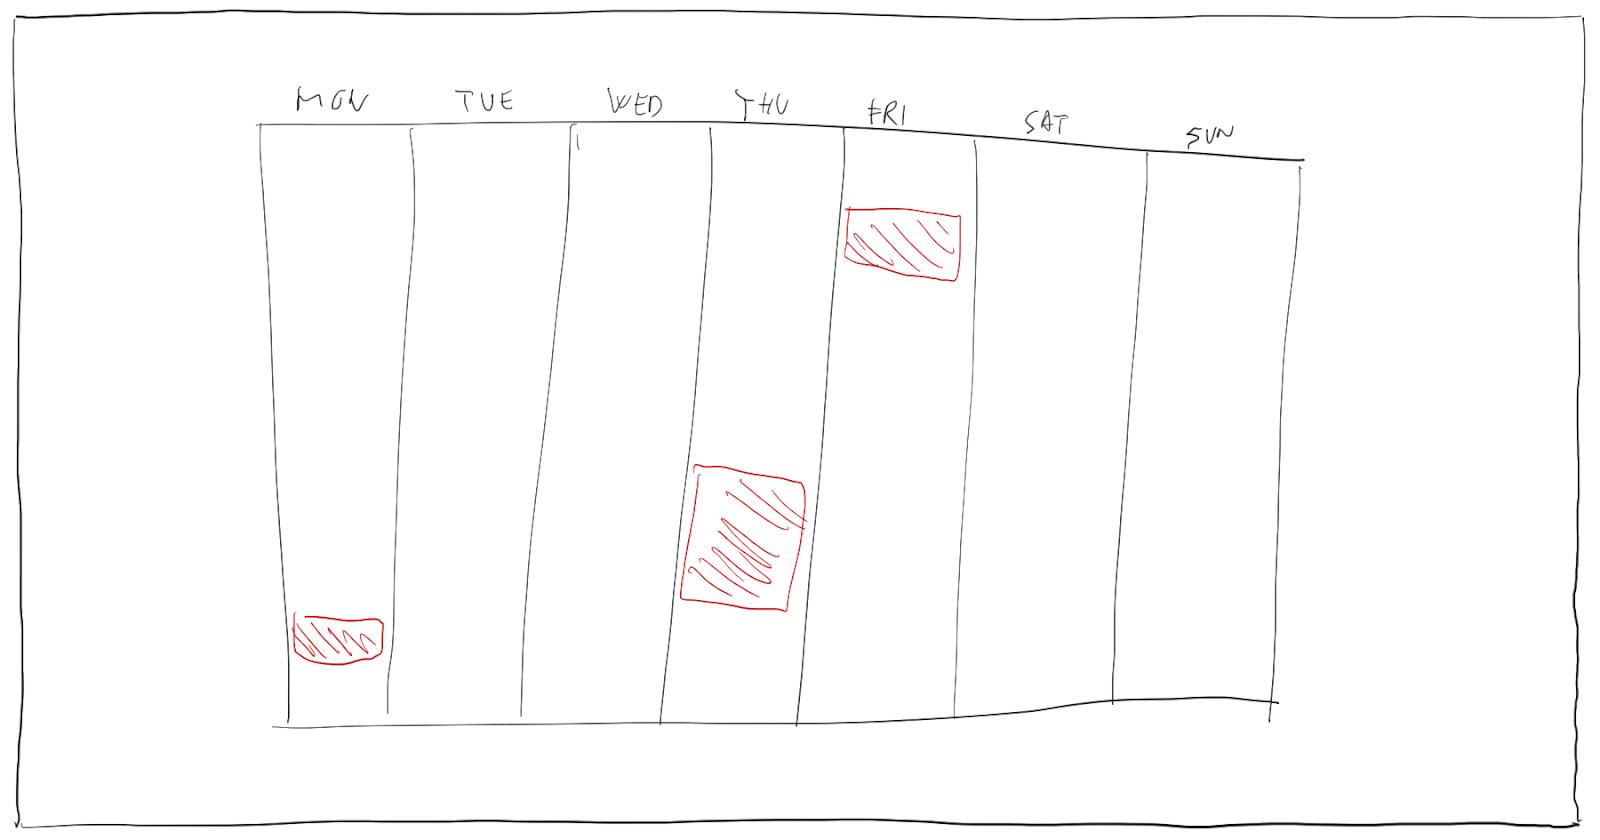 lean schedule